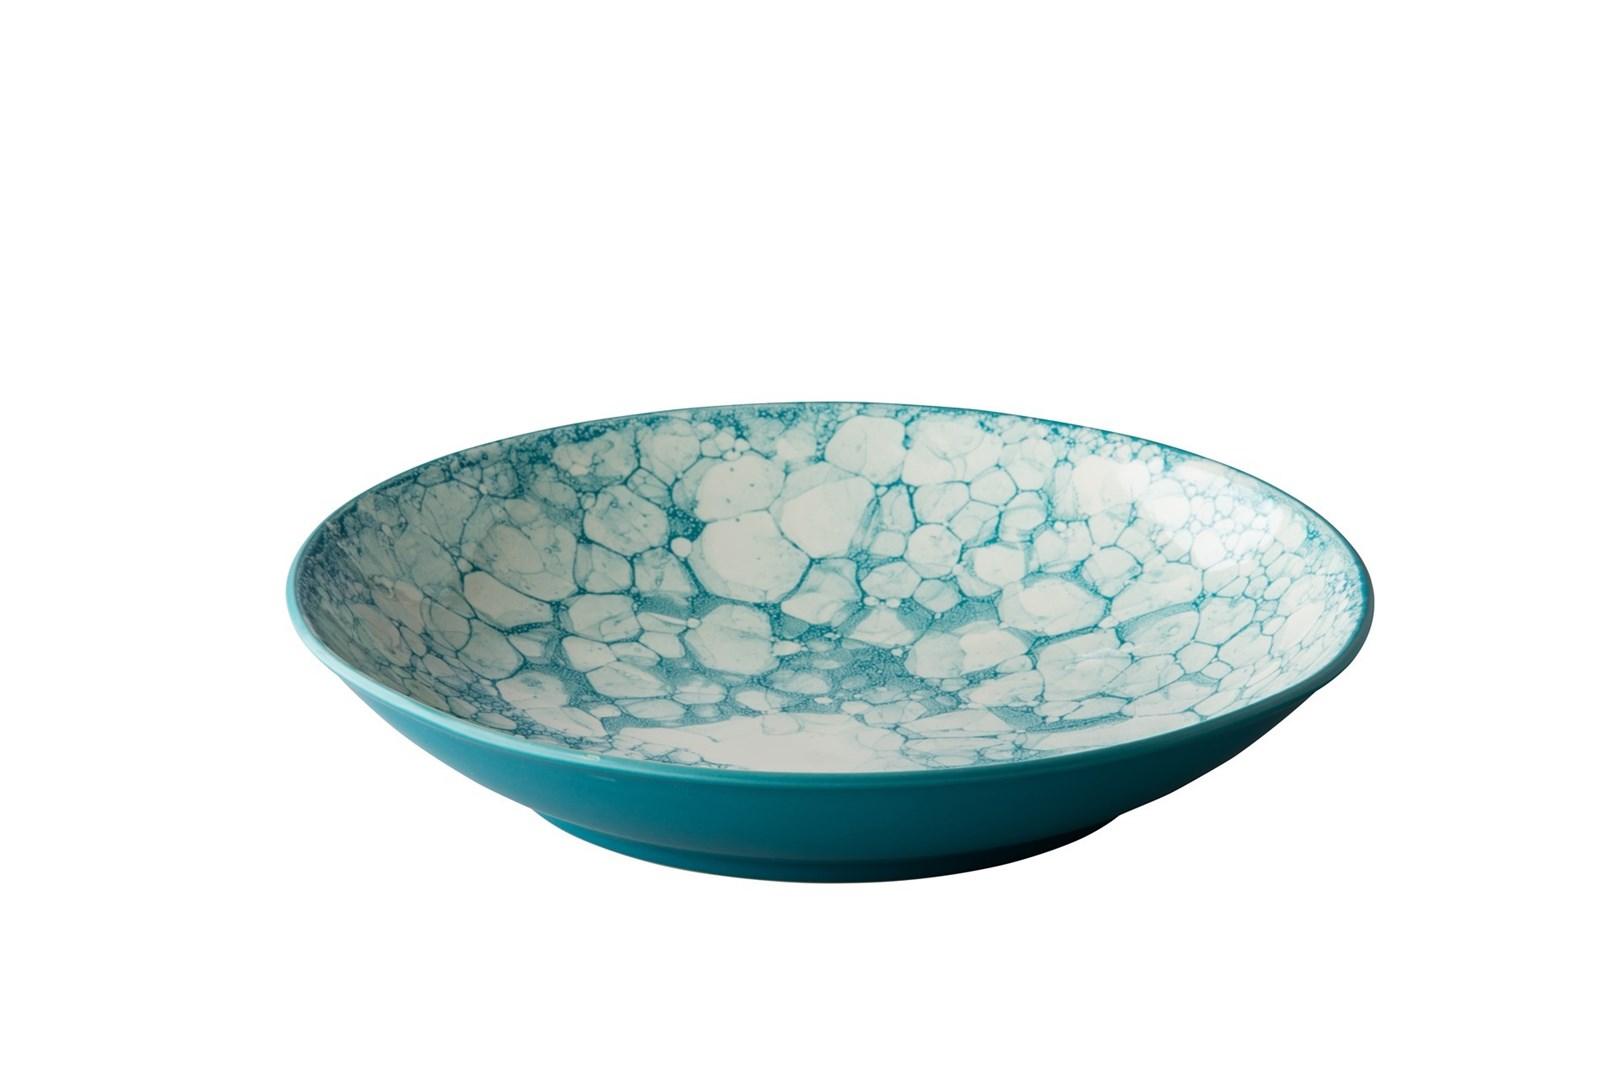 Productafbeelding Diep bord Bubble turquoise 25,5 cm